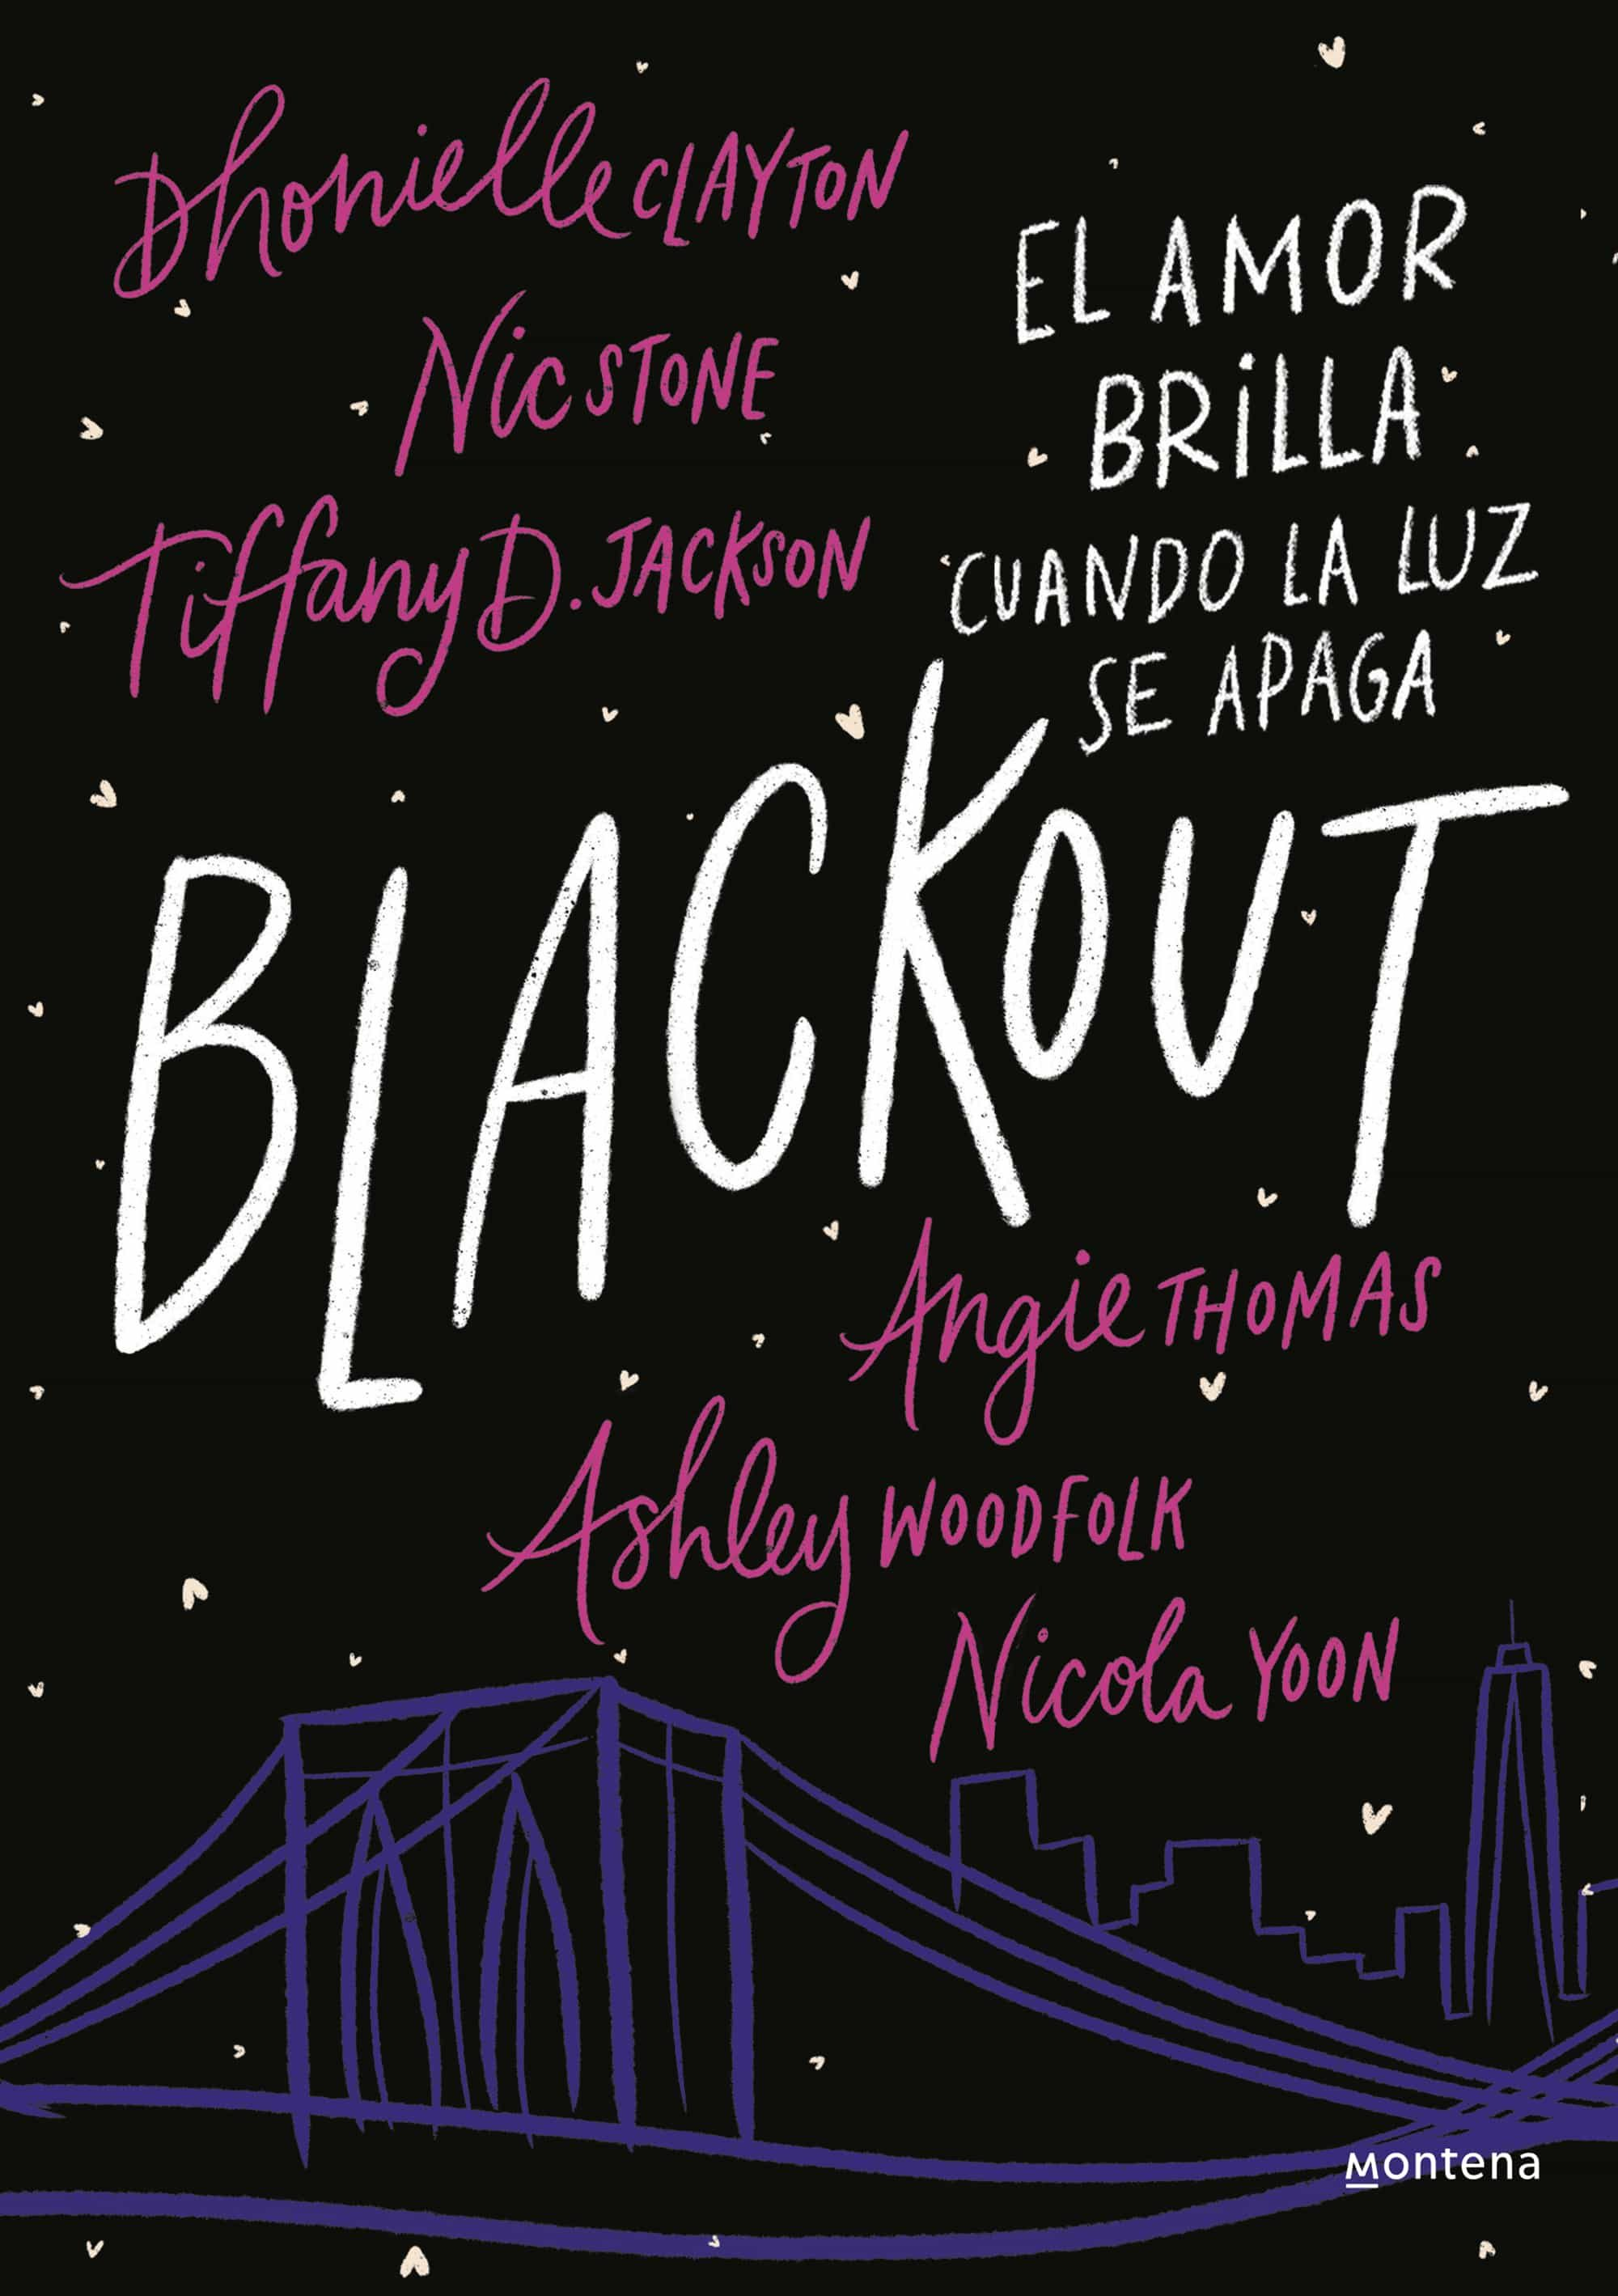 Blackout - Dhonielle Clayton